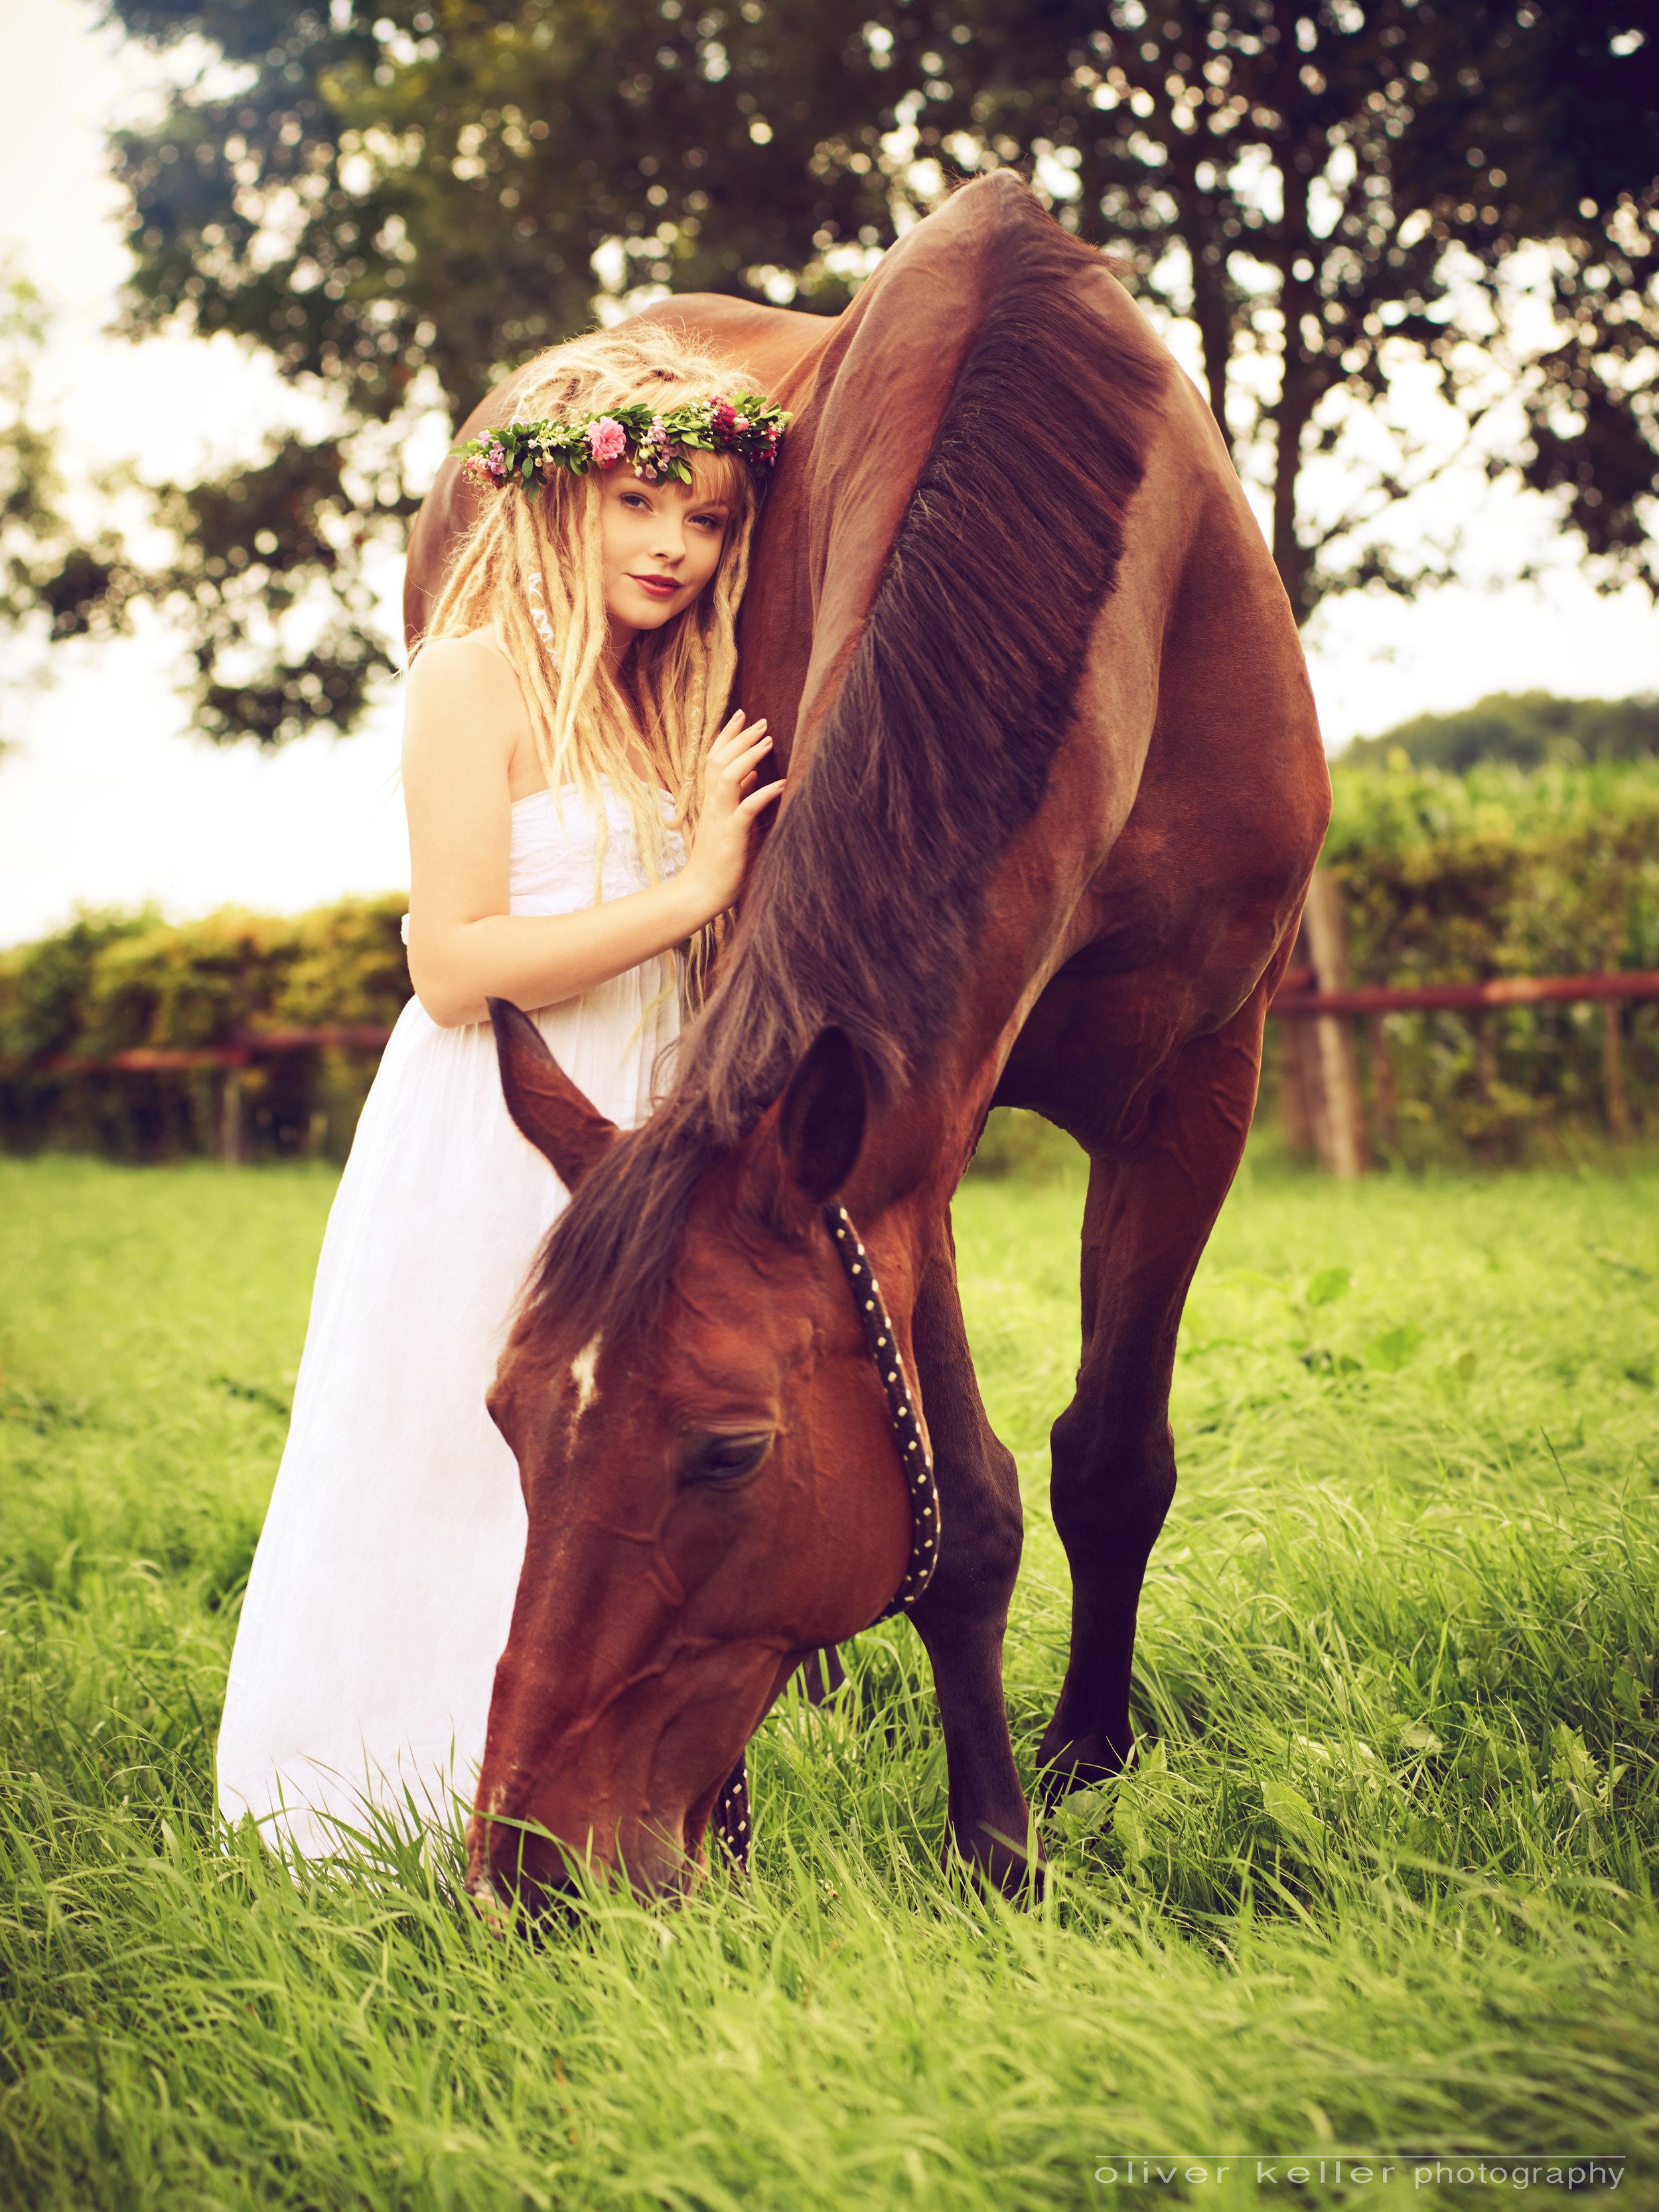 2017-07-13-summergirl-and-horse5259.jpg